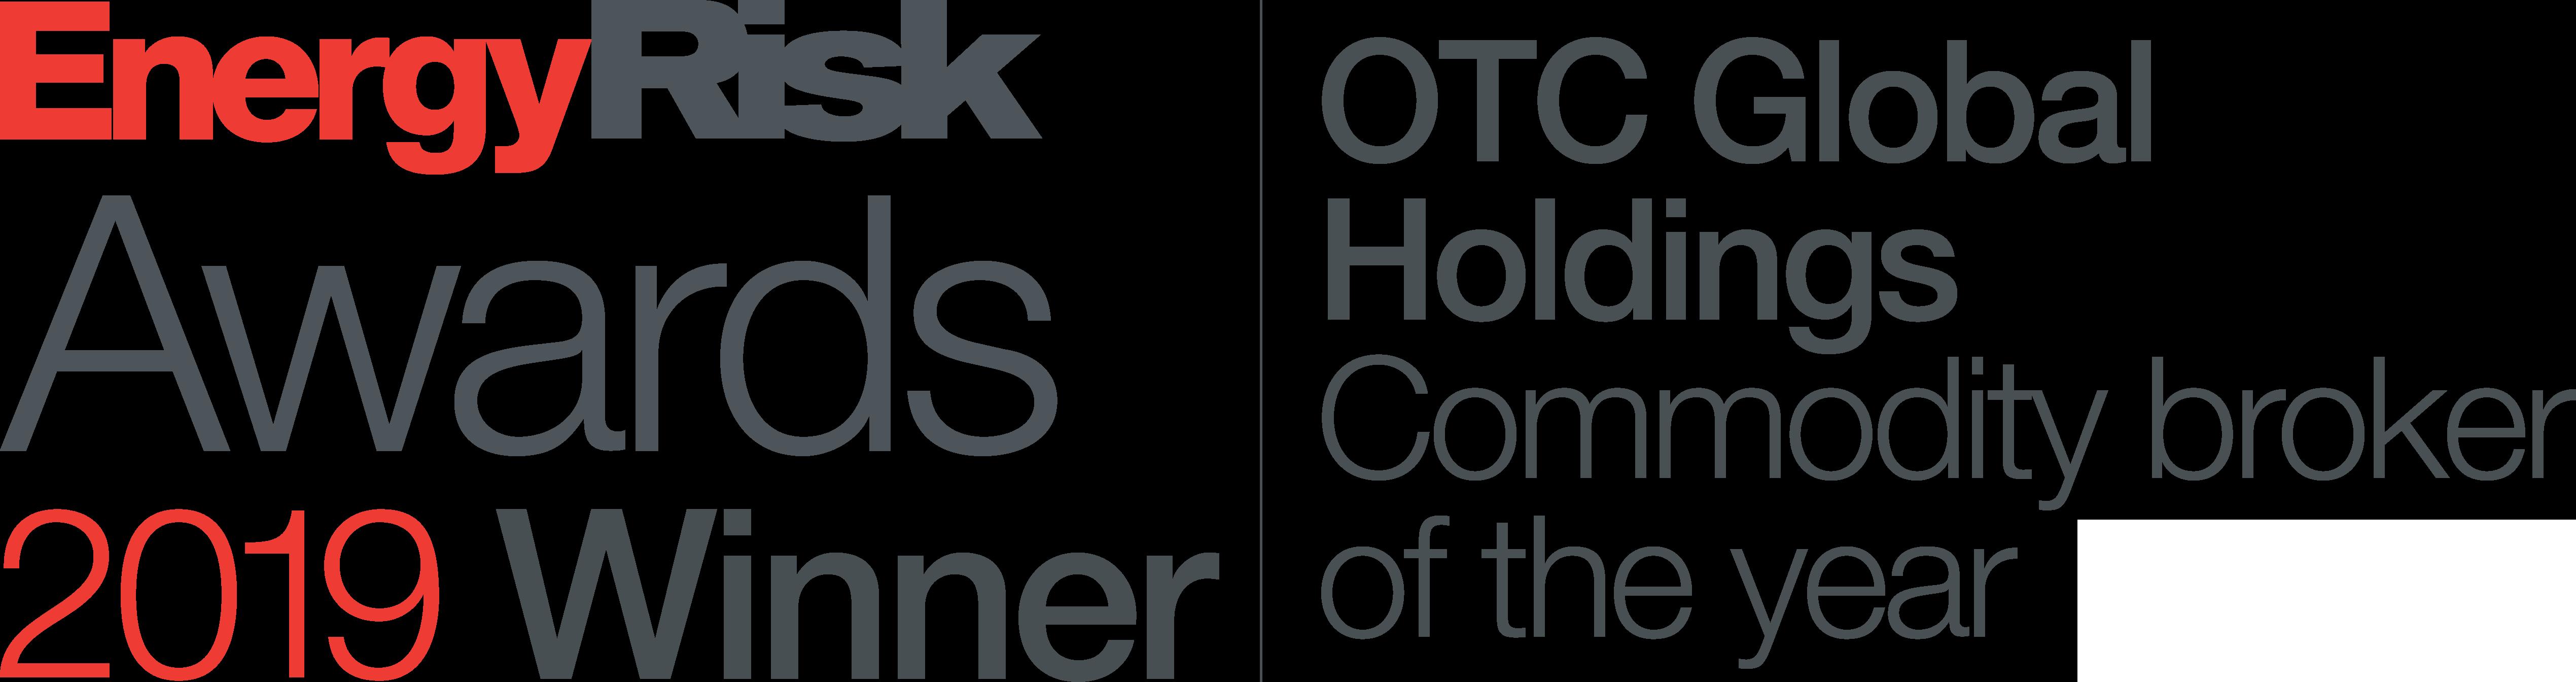 OTC Global Holdings - OTC Global Holdings is the leading